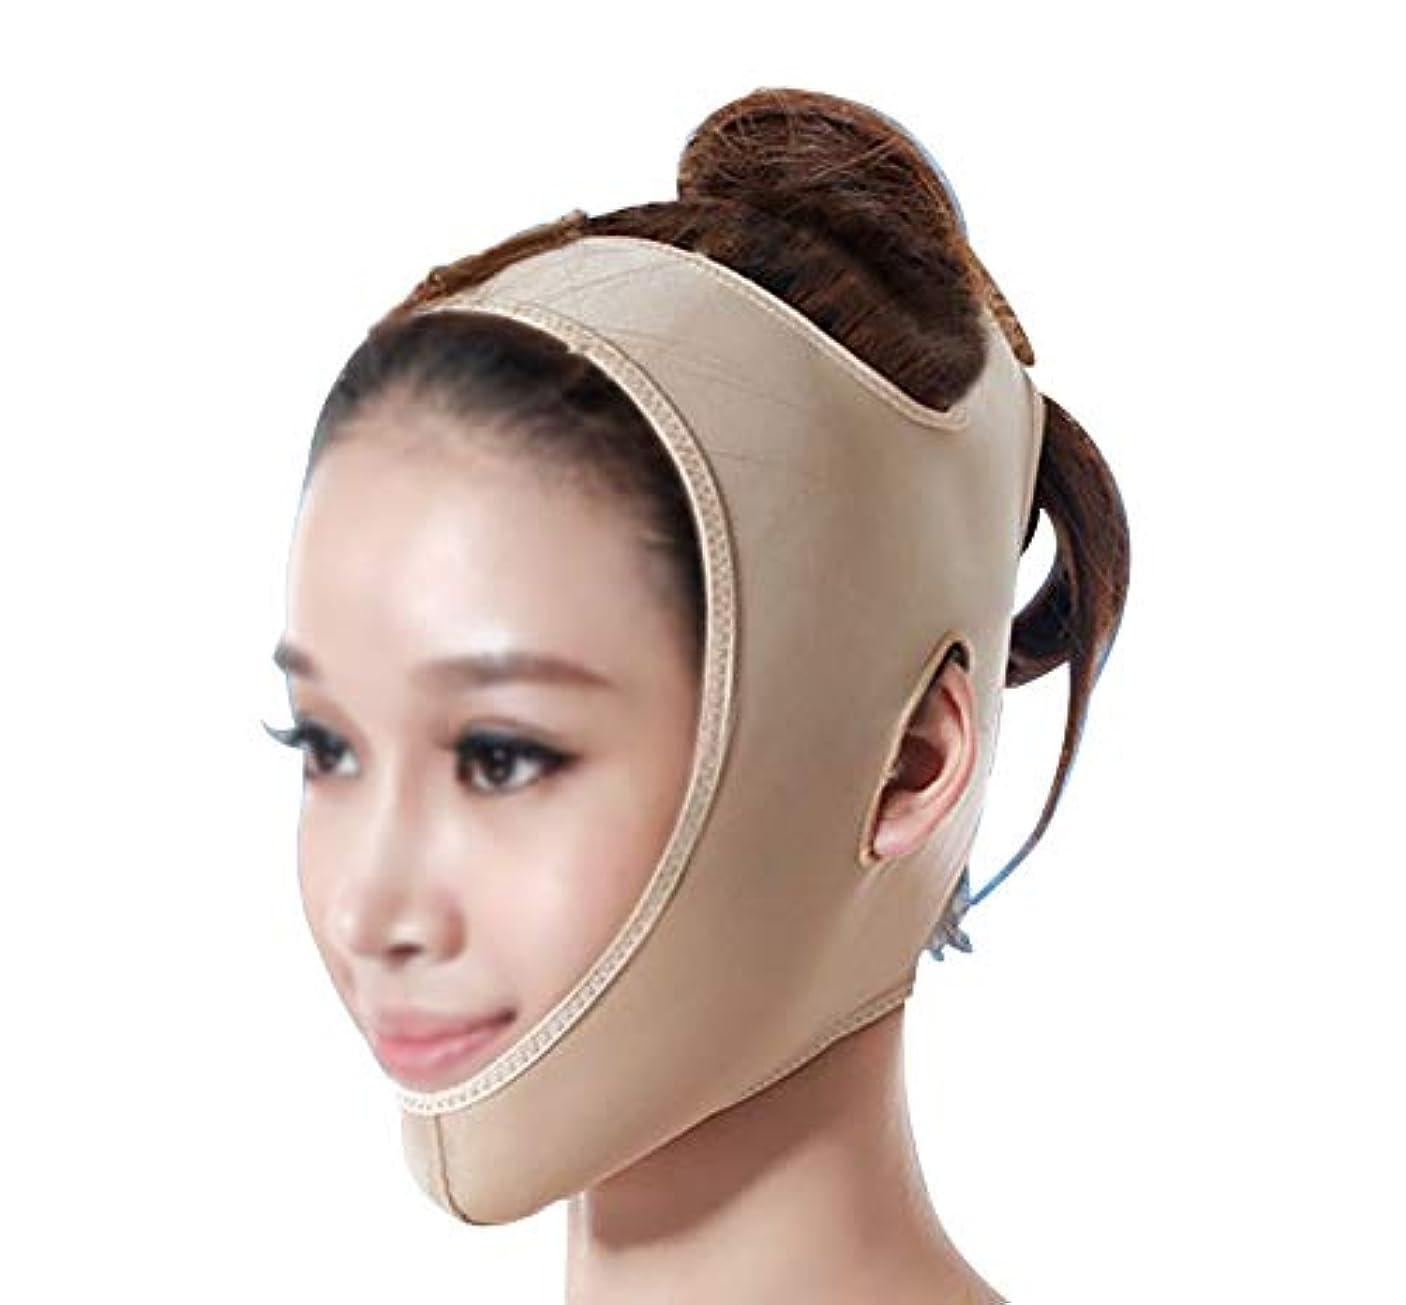 XHLMRMJ フェイス&ネックリフト、減量フェイスリフティングアーティファクトマスク垂れ防止薄い咬筋筋肉ダブルあごフェイシャルリフティング引き締め首スリーブ (Size : Xl)